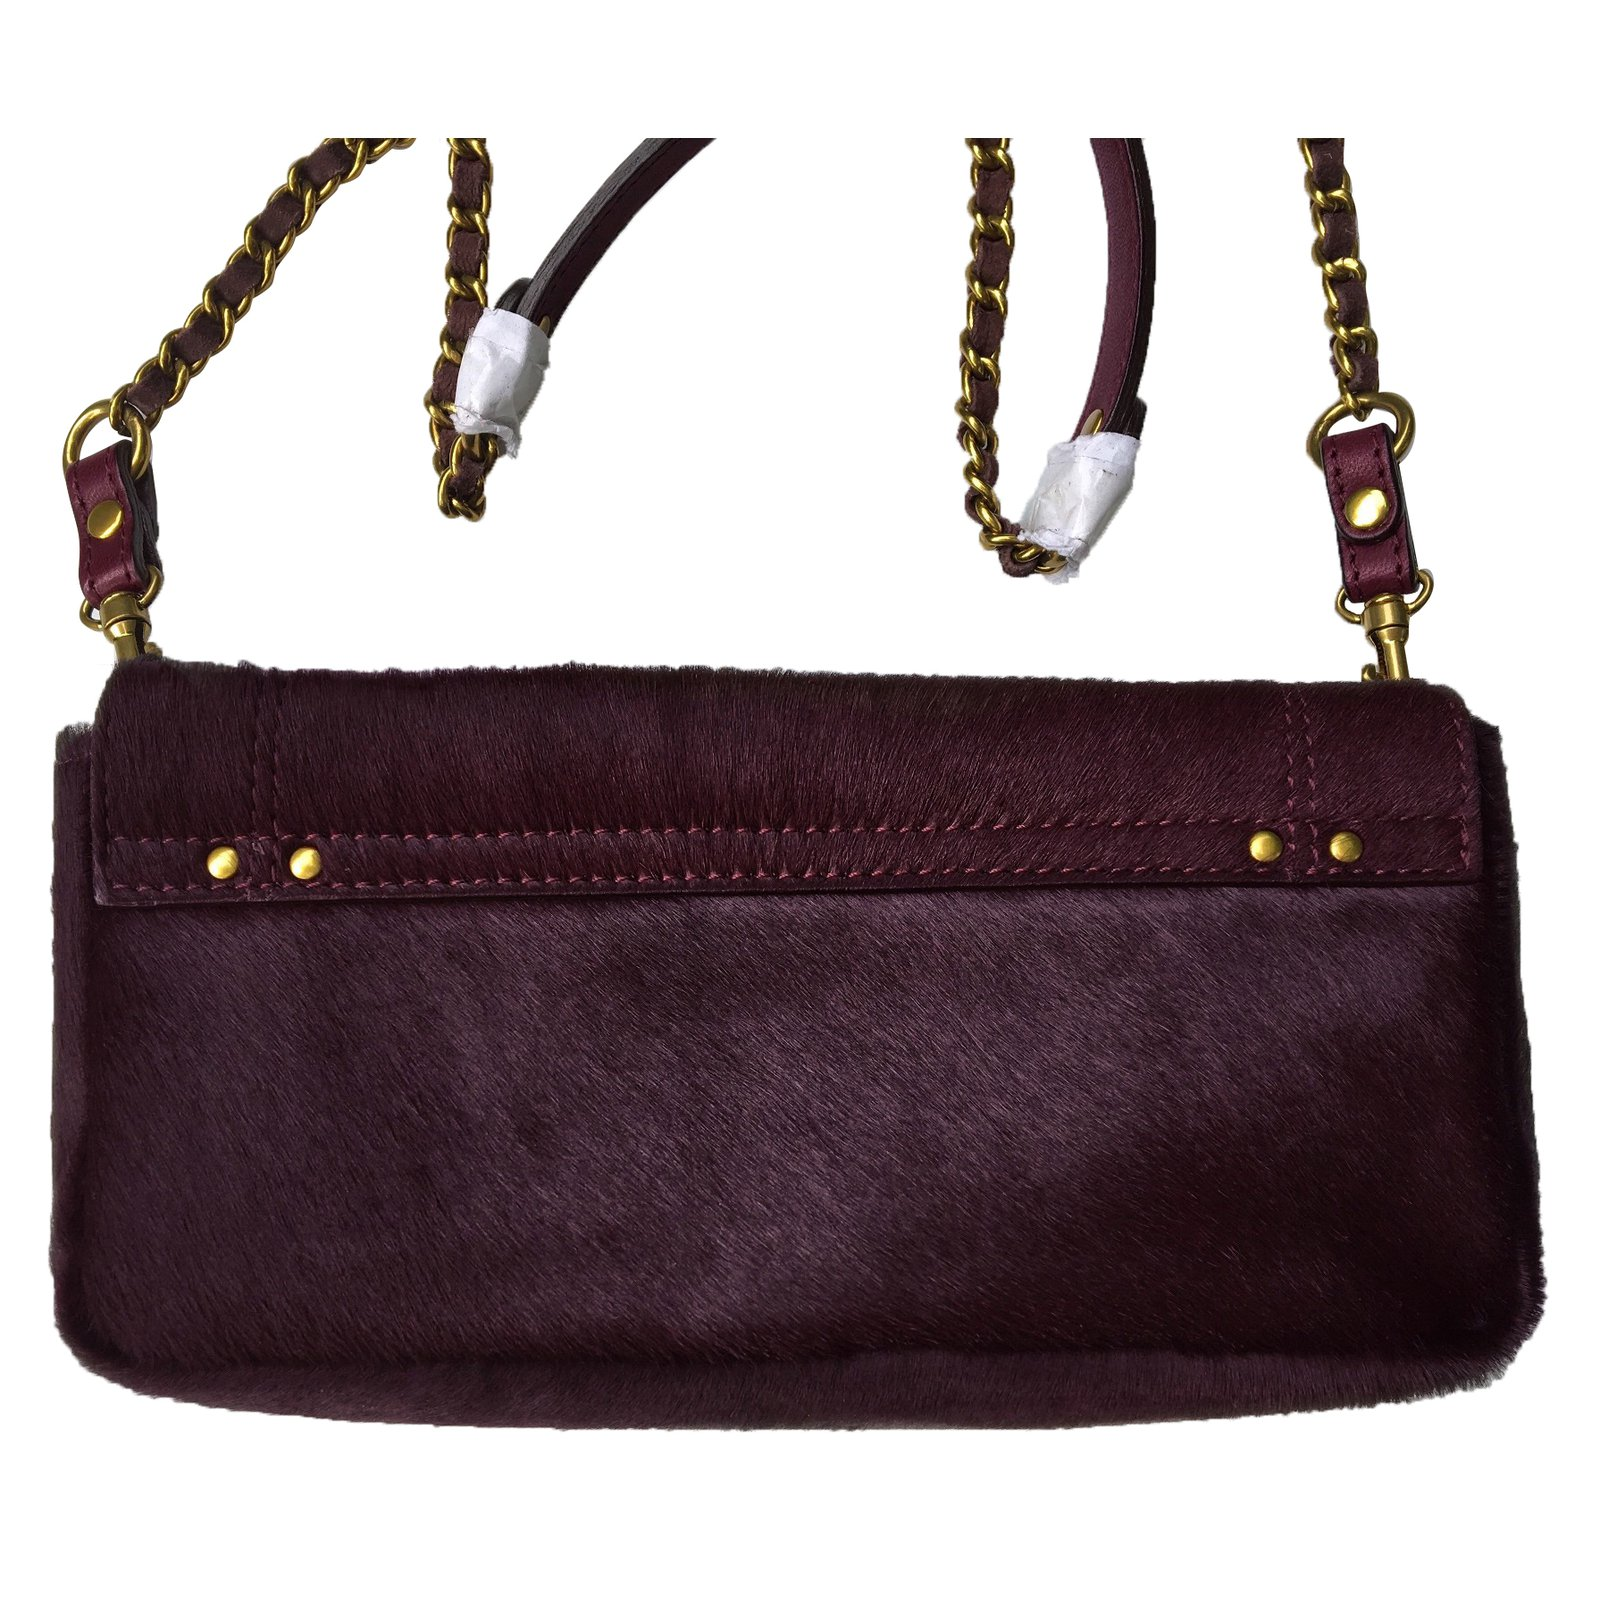 993451ae23a85 Jerome Dreyfuss BOB Handbags Pony-style calfskin Dark red ref.74269 - Joli  Closet